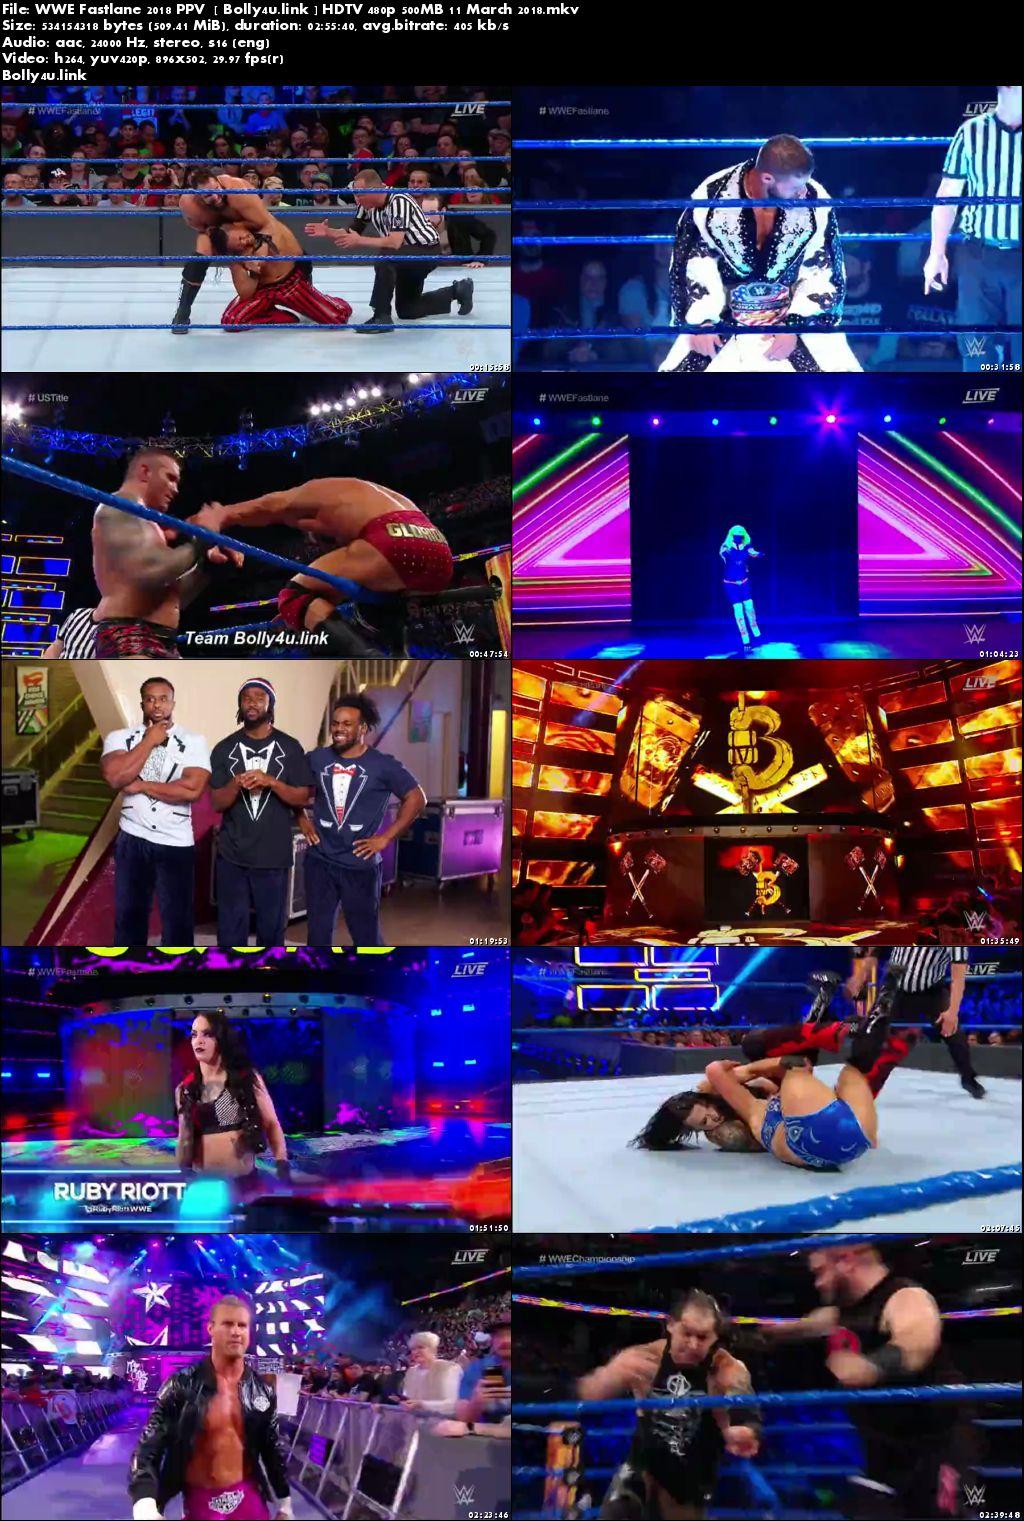 WWE Fastlane 2018 PPV HDTV 480p 500MB 11 March 2018 Download